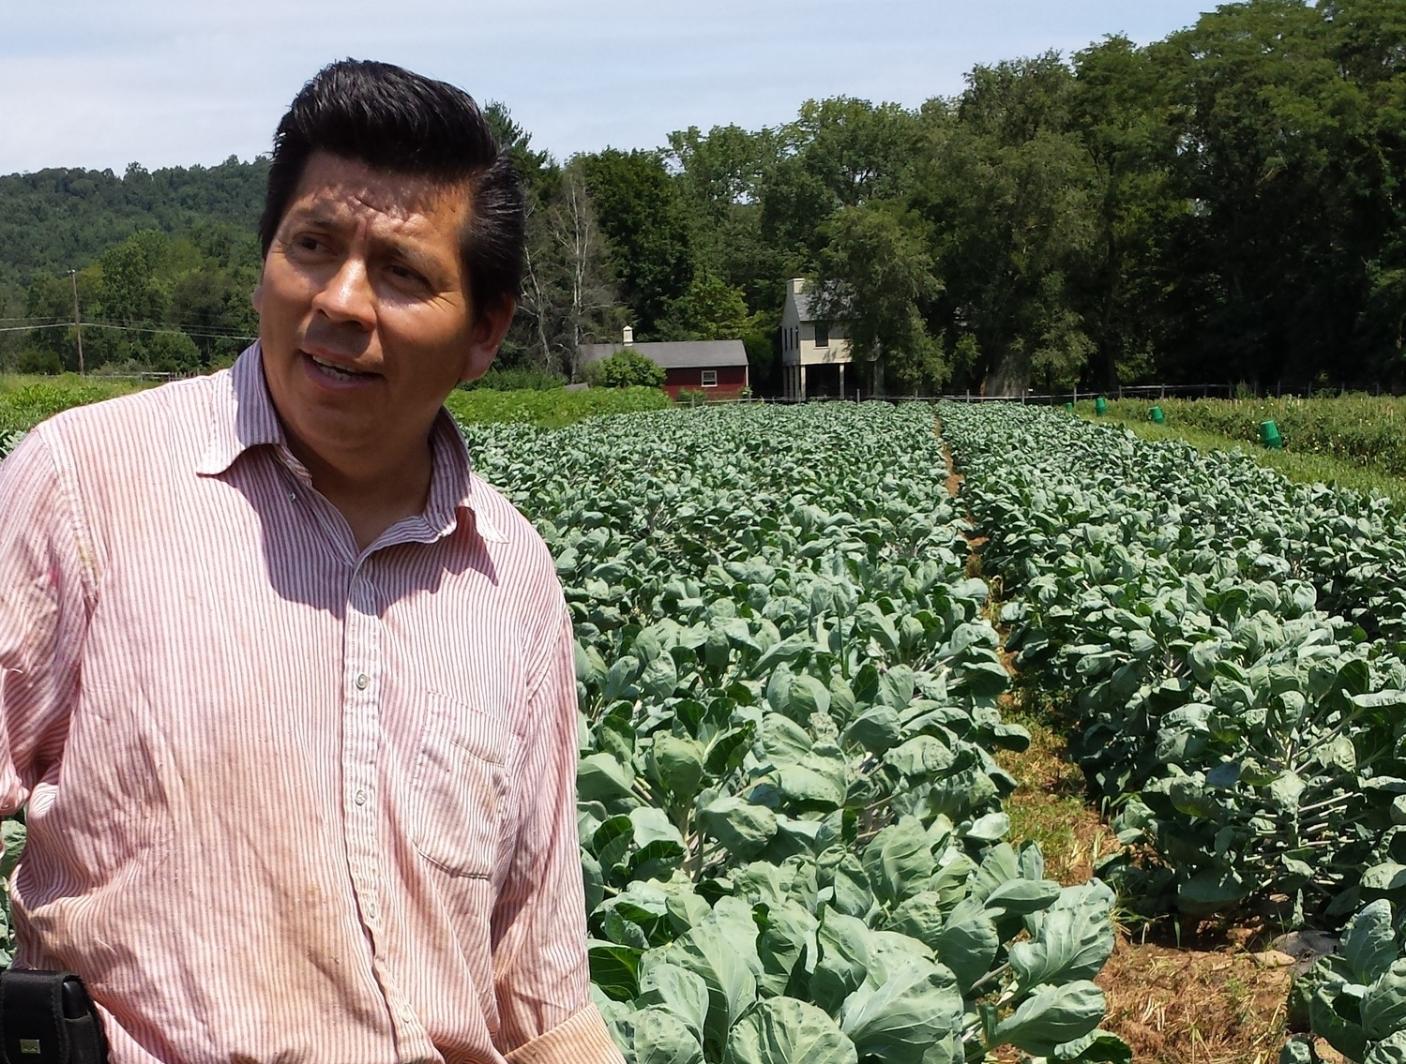 Jersey Farm Produce Diversified Fruit & Vegetable Pittstown, NJ